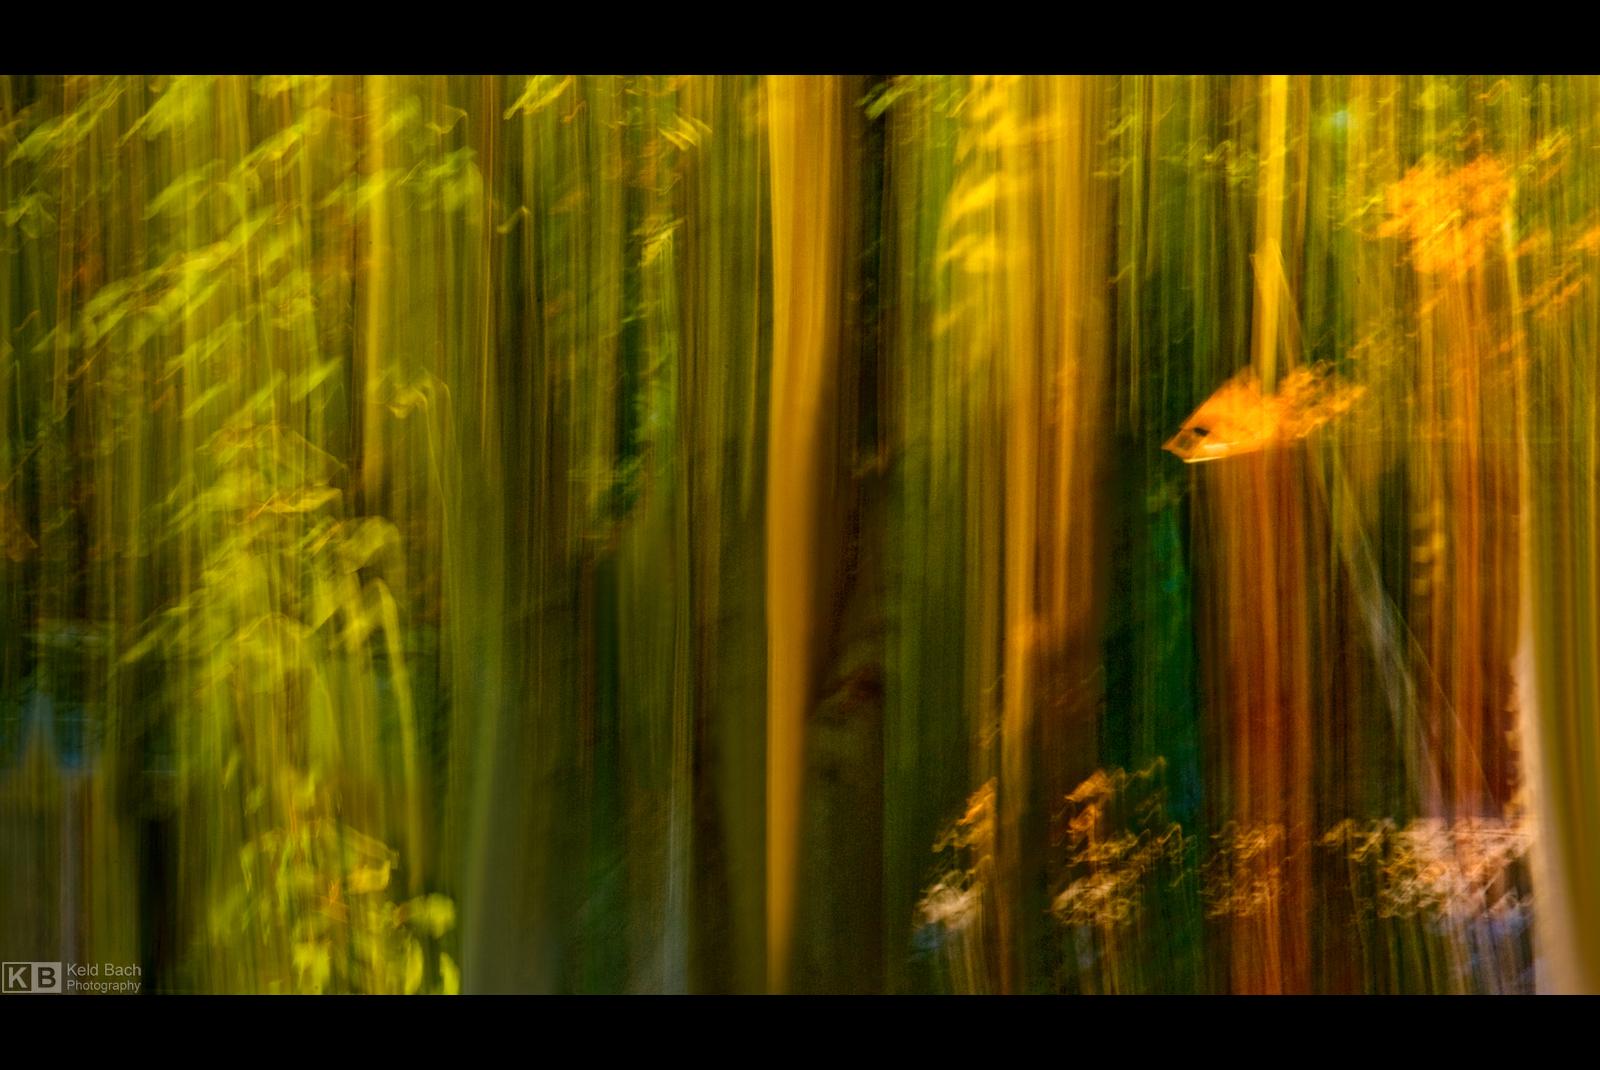 Underwater Forest by KeldBach